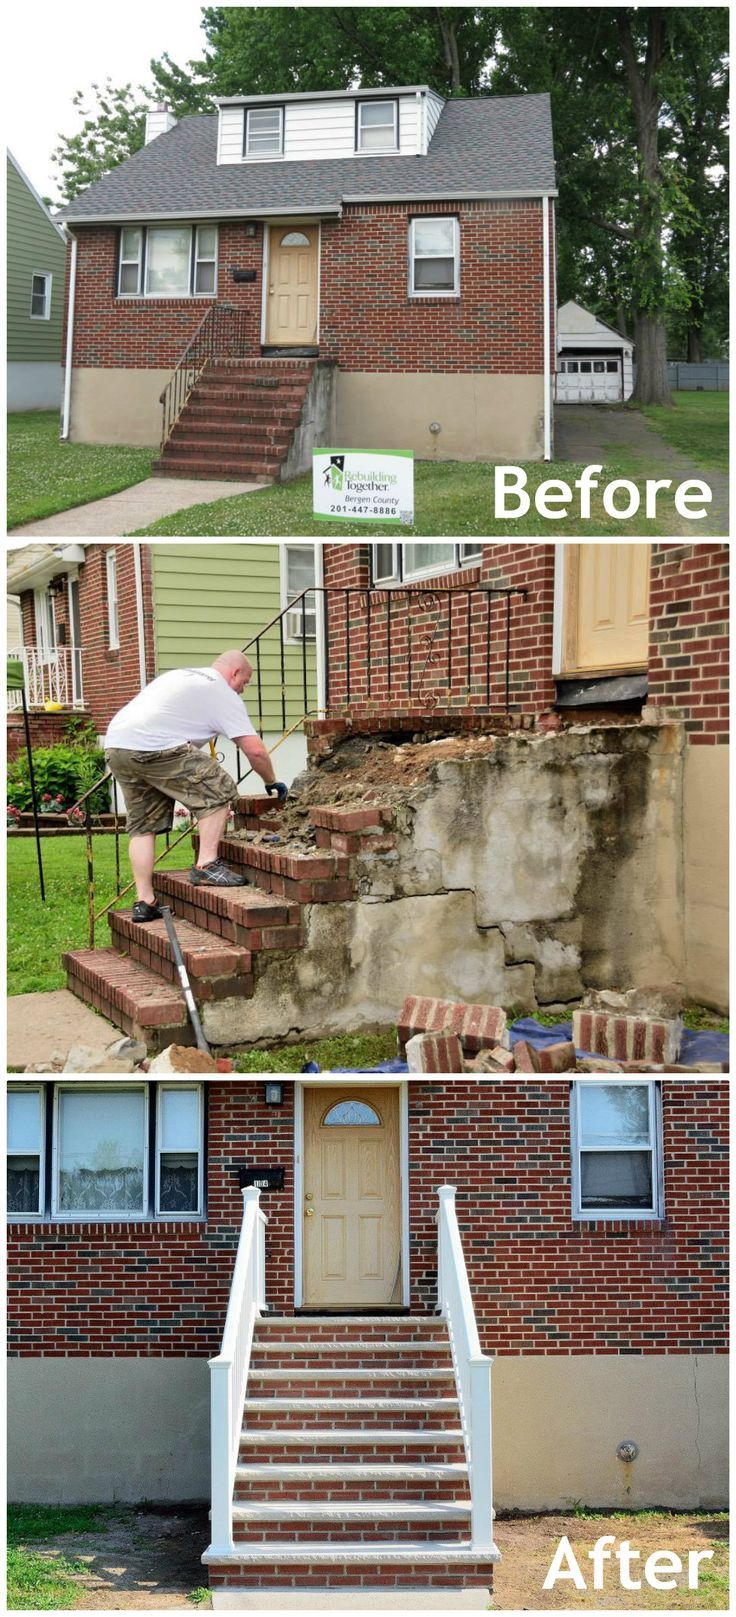 17 best images about home transformations on pinterest for Bergen garage door